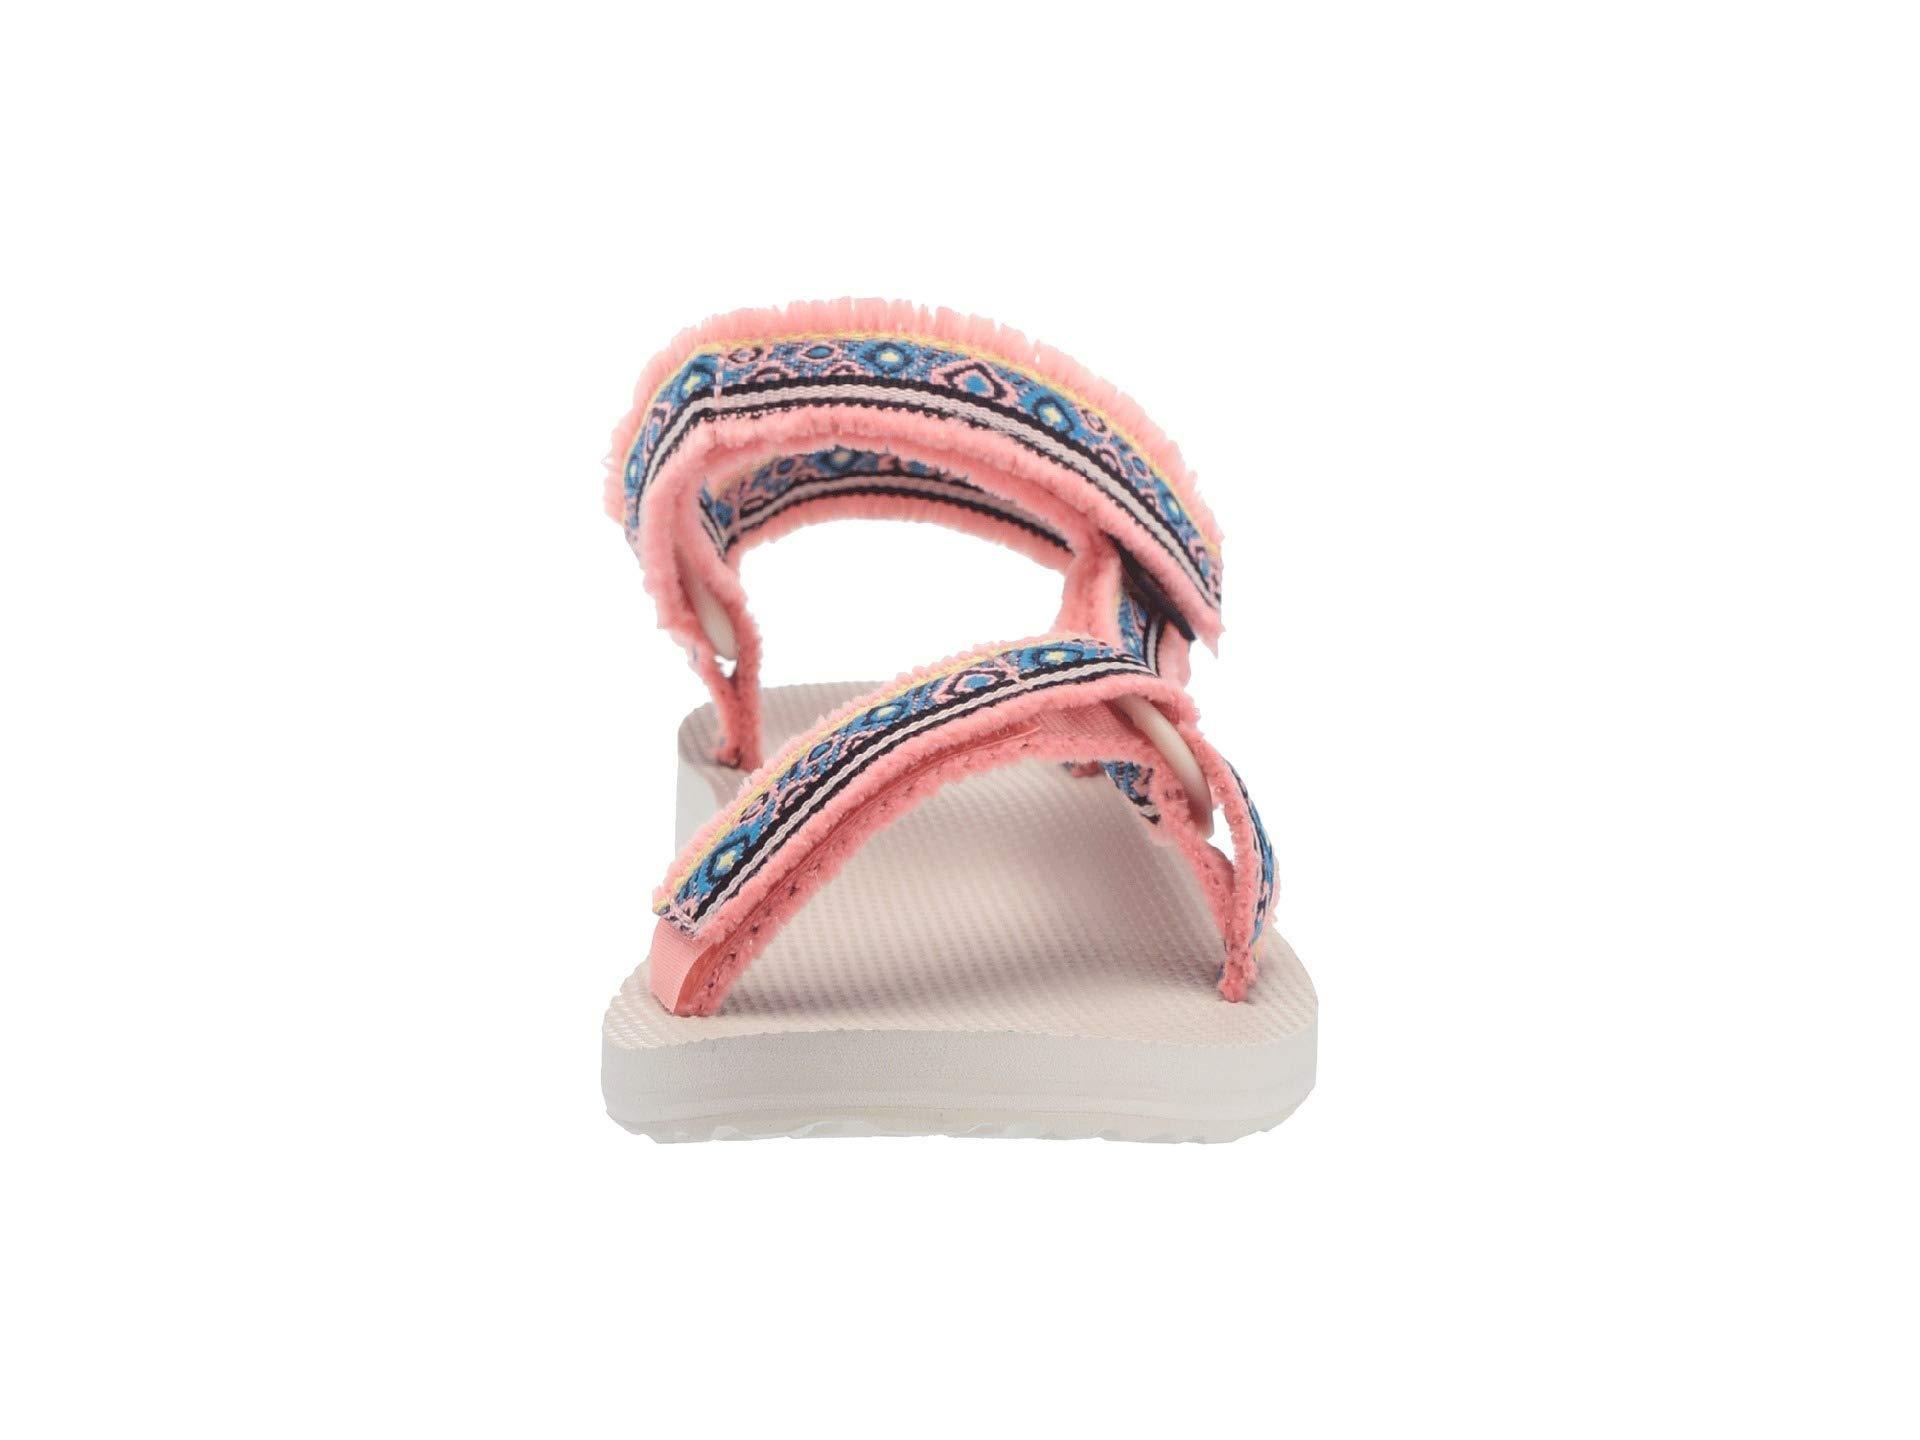 ebeb8f751 Teva - Pink Original Universal Maressa (maressa Sunflower Multi) Women s  Shoes - Lyst. View fullscreen